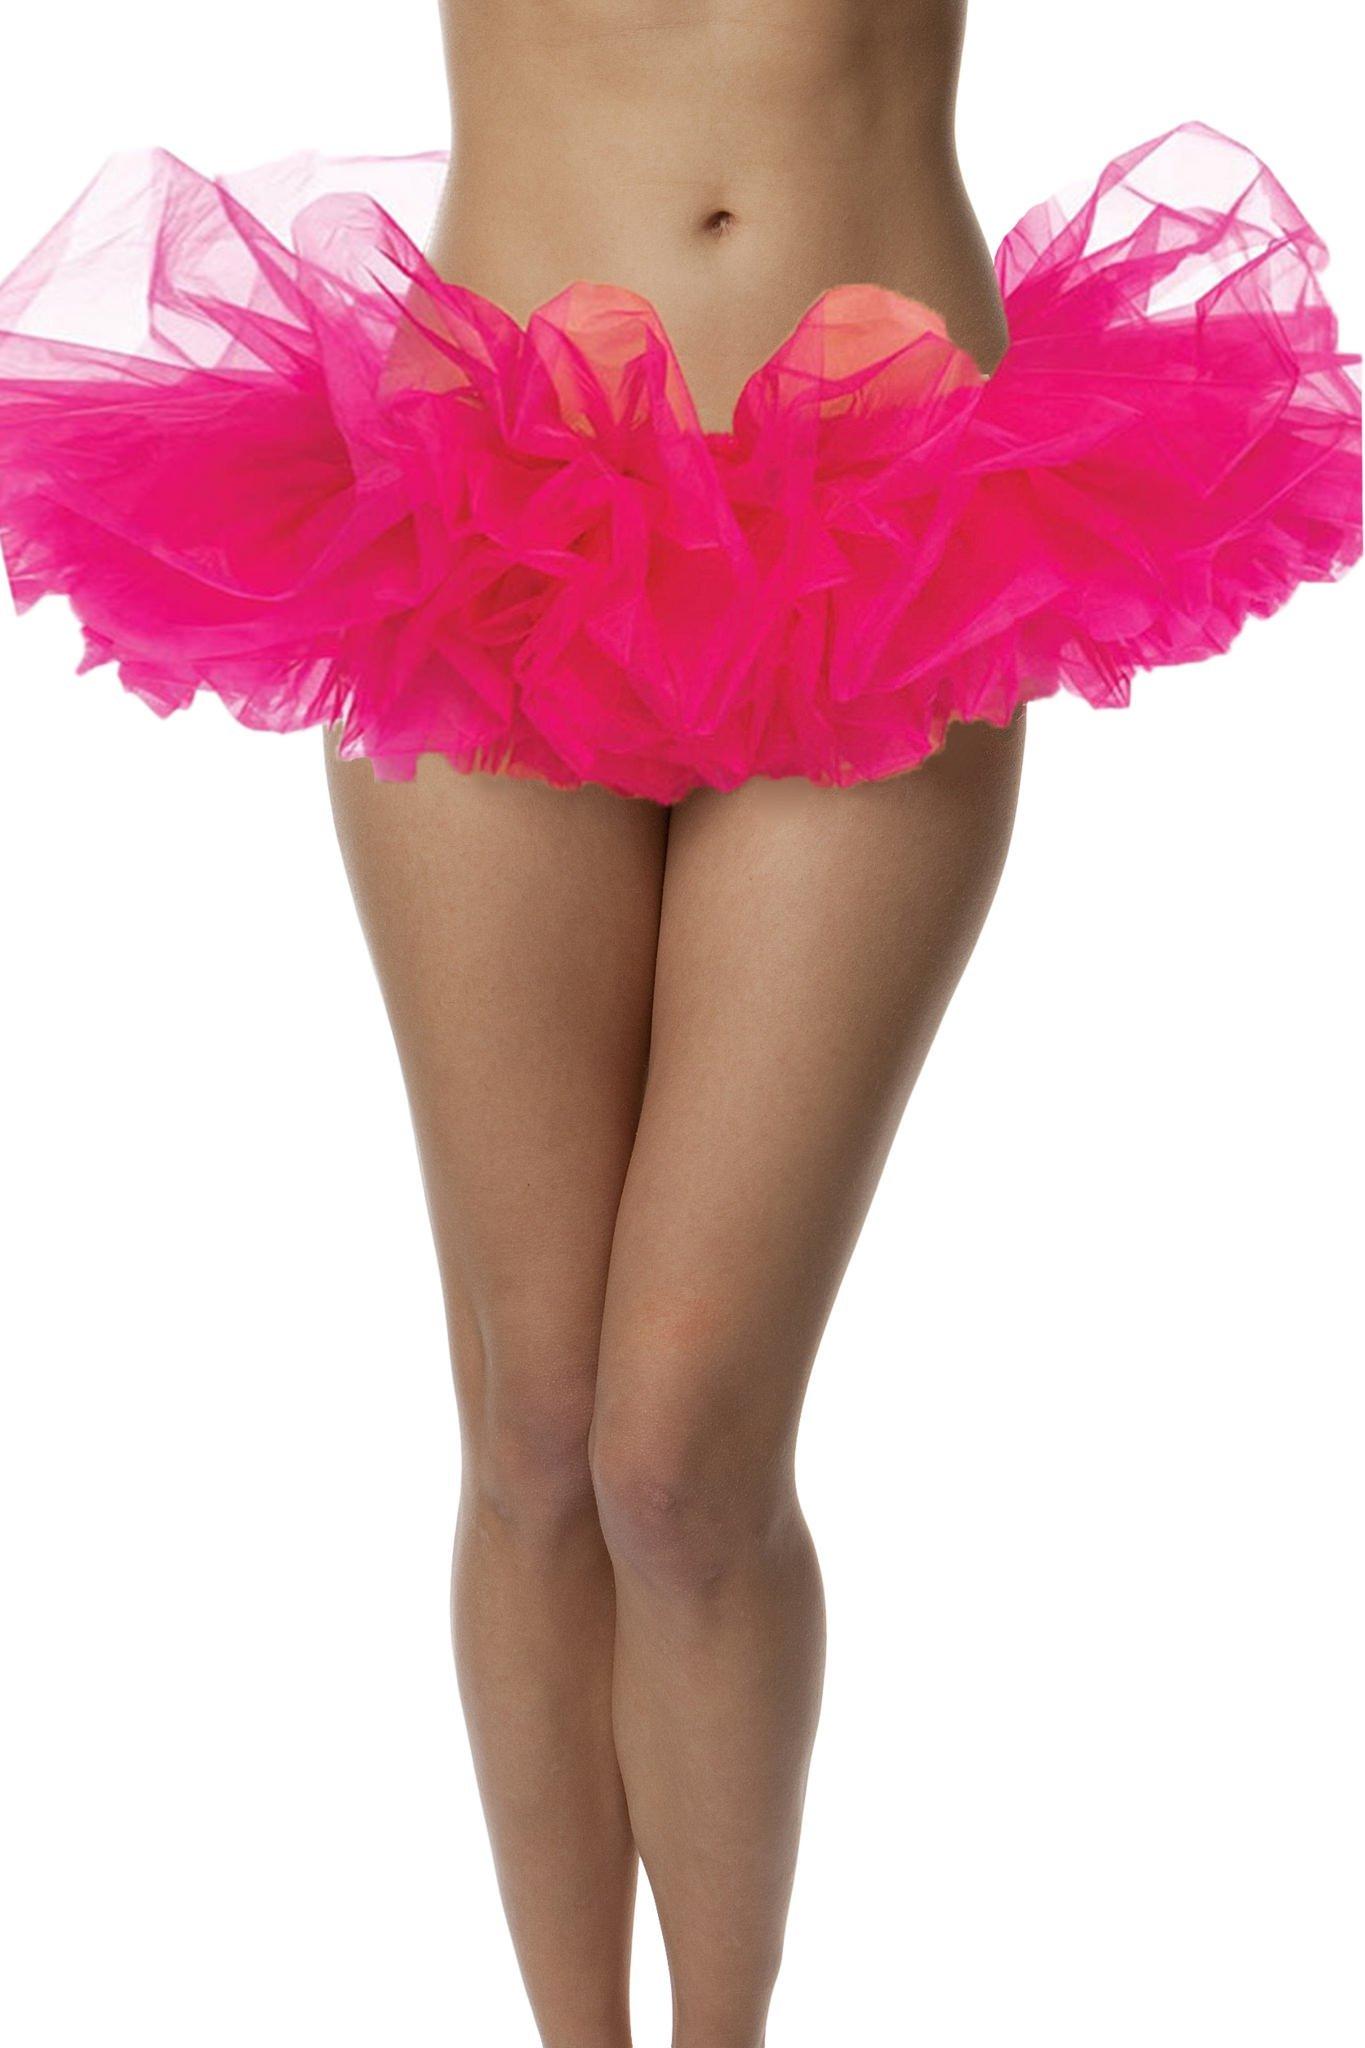 BellaSous Adult Tutu Skirt, Ballet Tutu Style, by Perfect Princess Tutu, Adult Dance Skirt, Rehearsal Tutu, Or Petticoat Skirt. Plus Size Tutu Available! (Hot Pink Tutu, Standard Size)